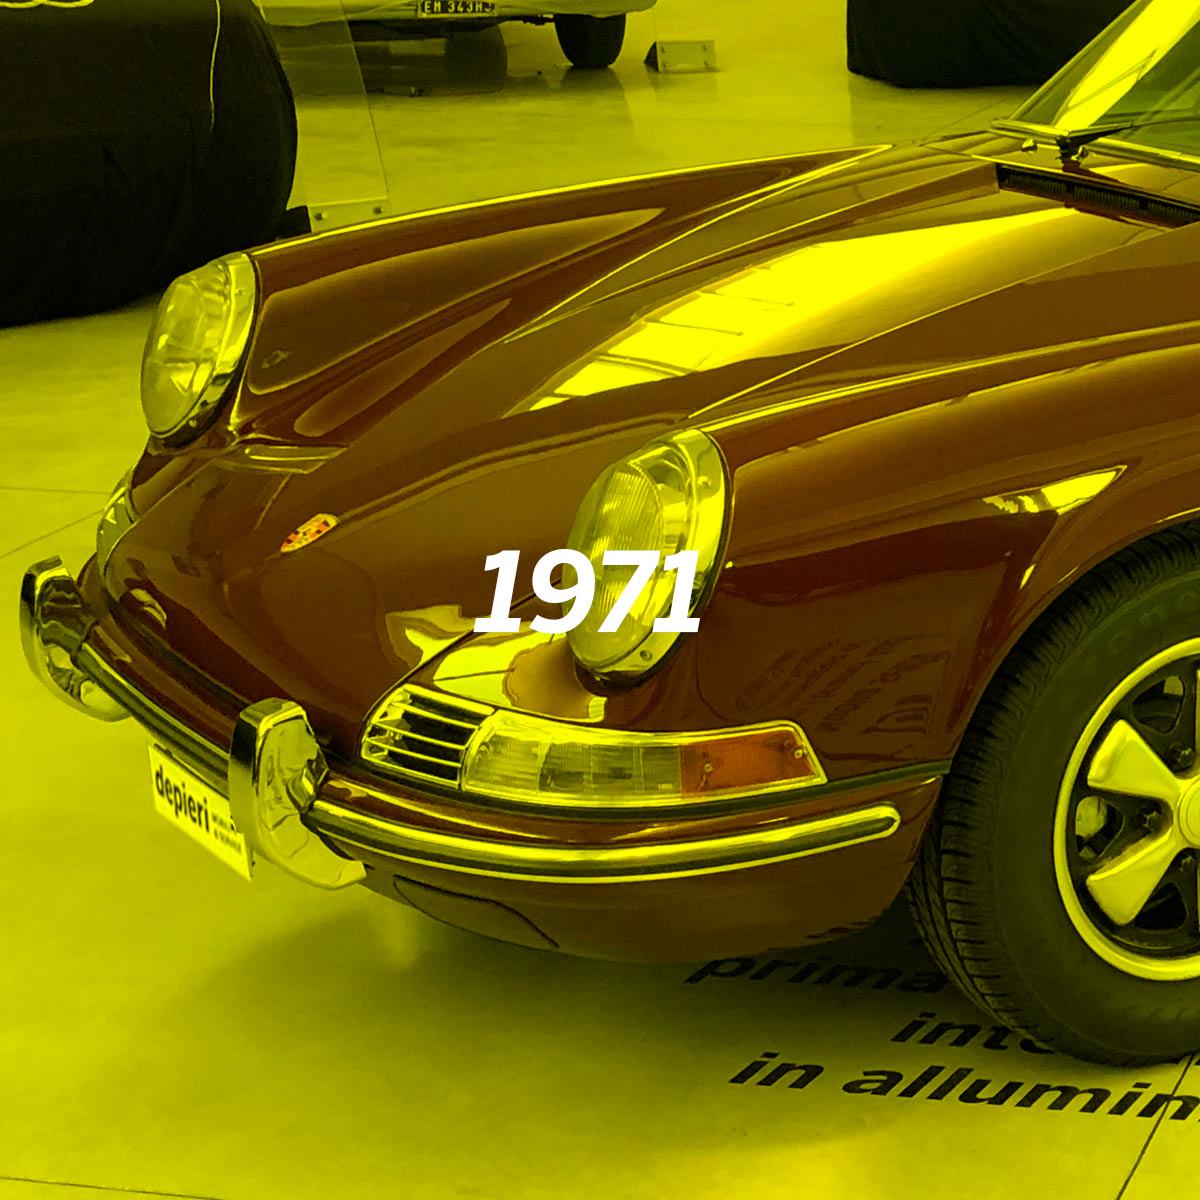 1971 4